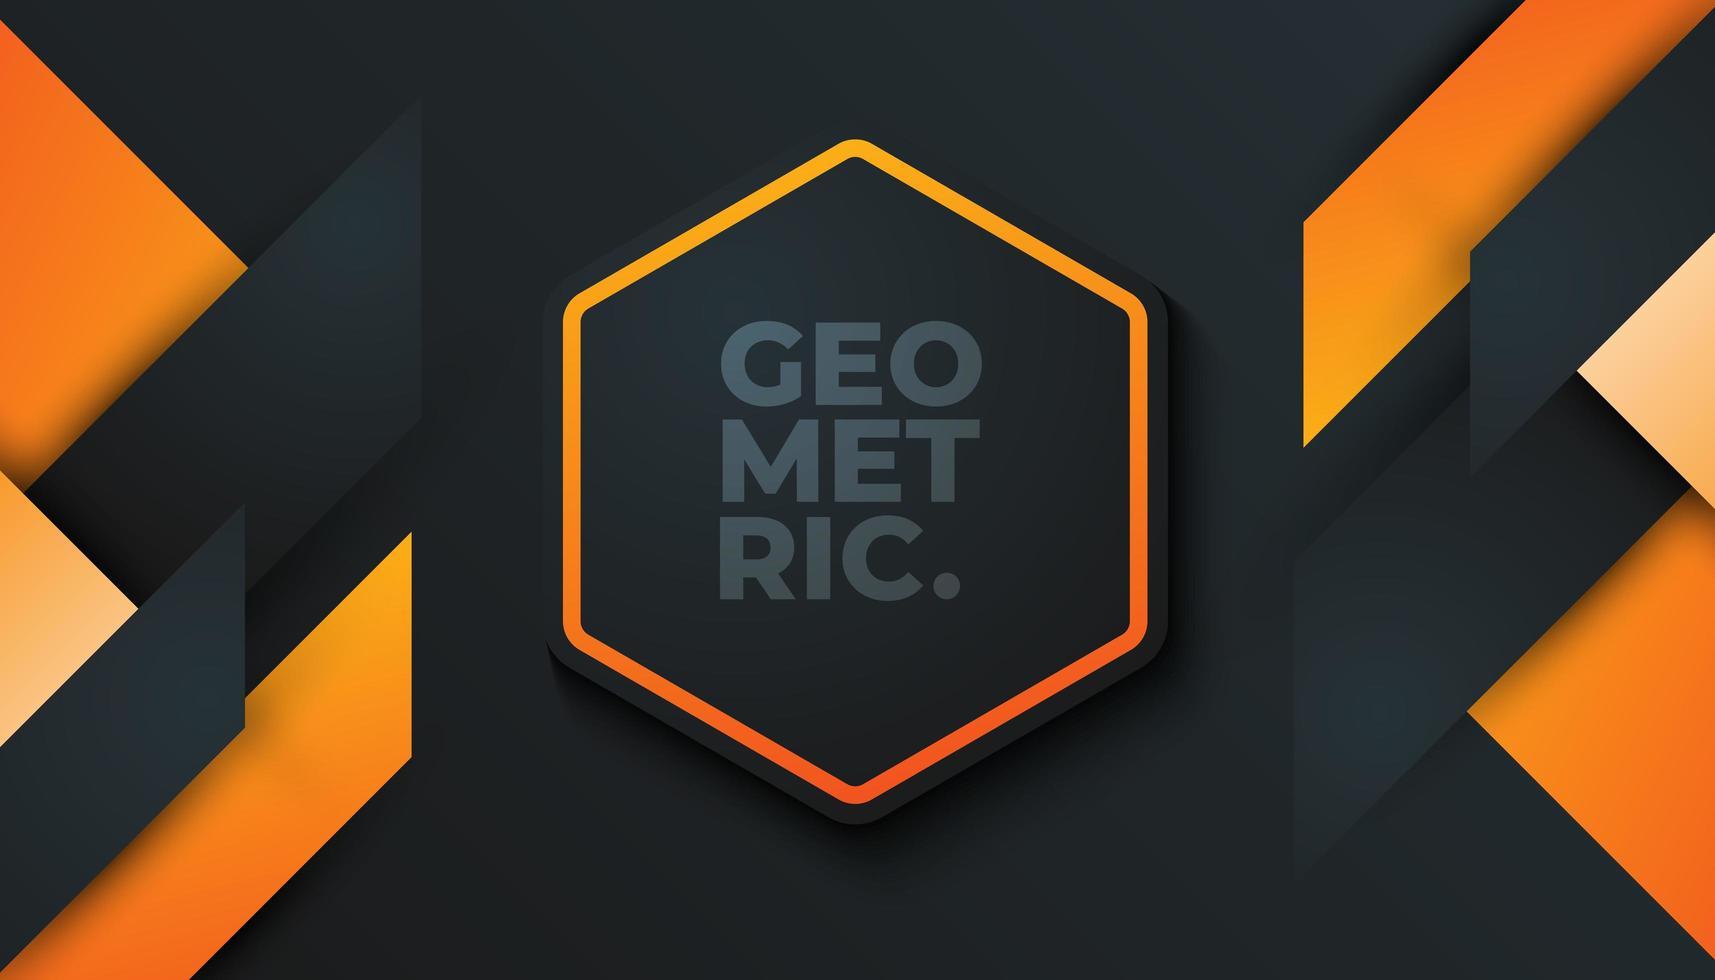 Fondo geométrico mínimo vector